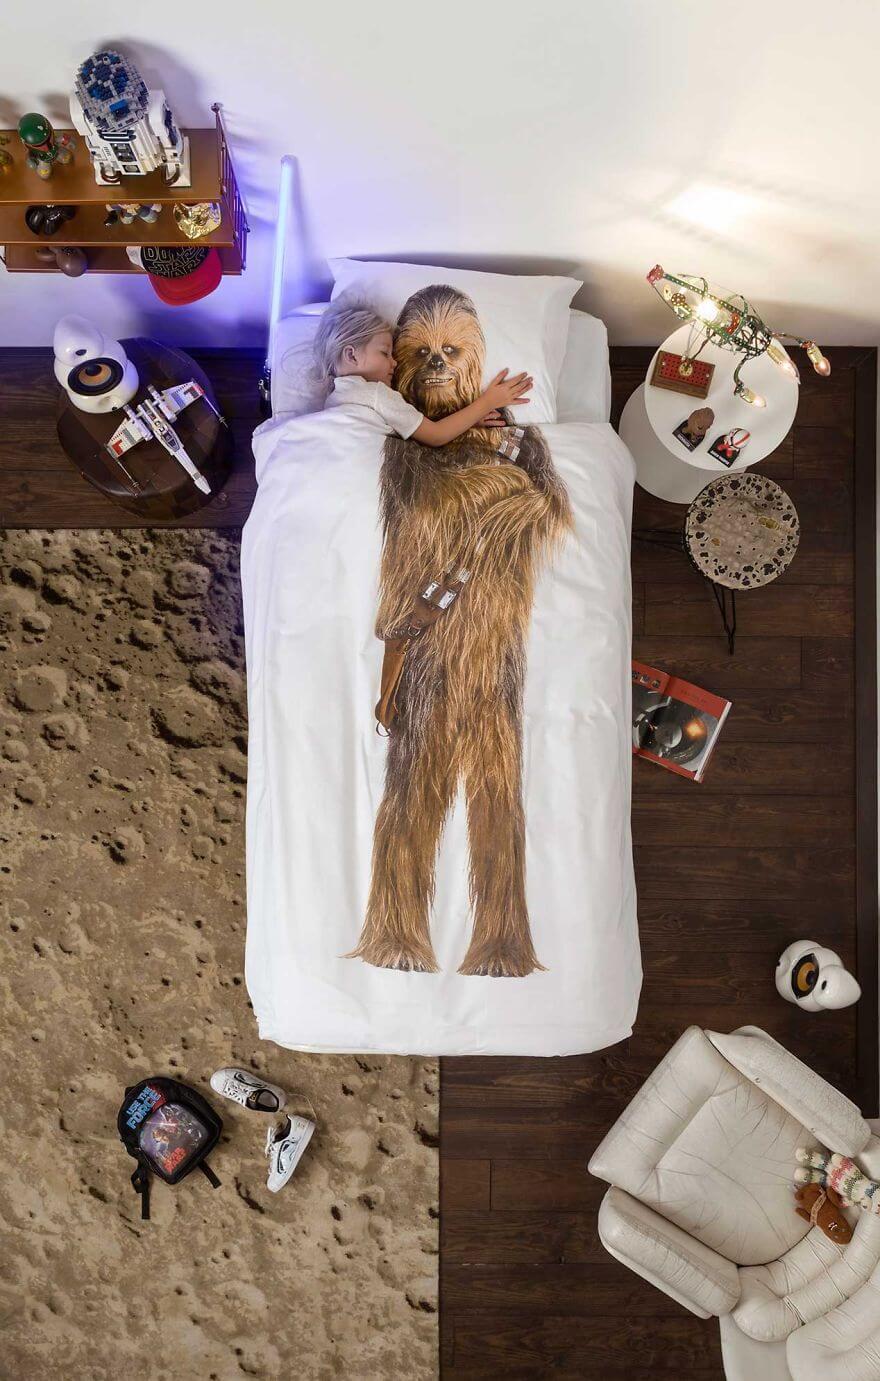 star wars bedding 3 (1)